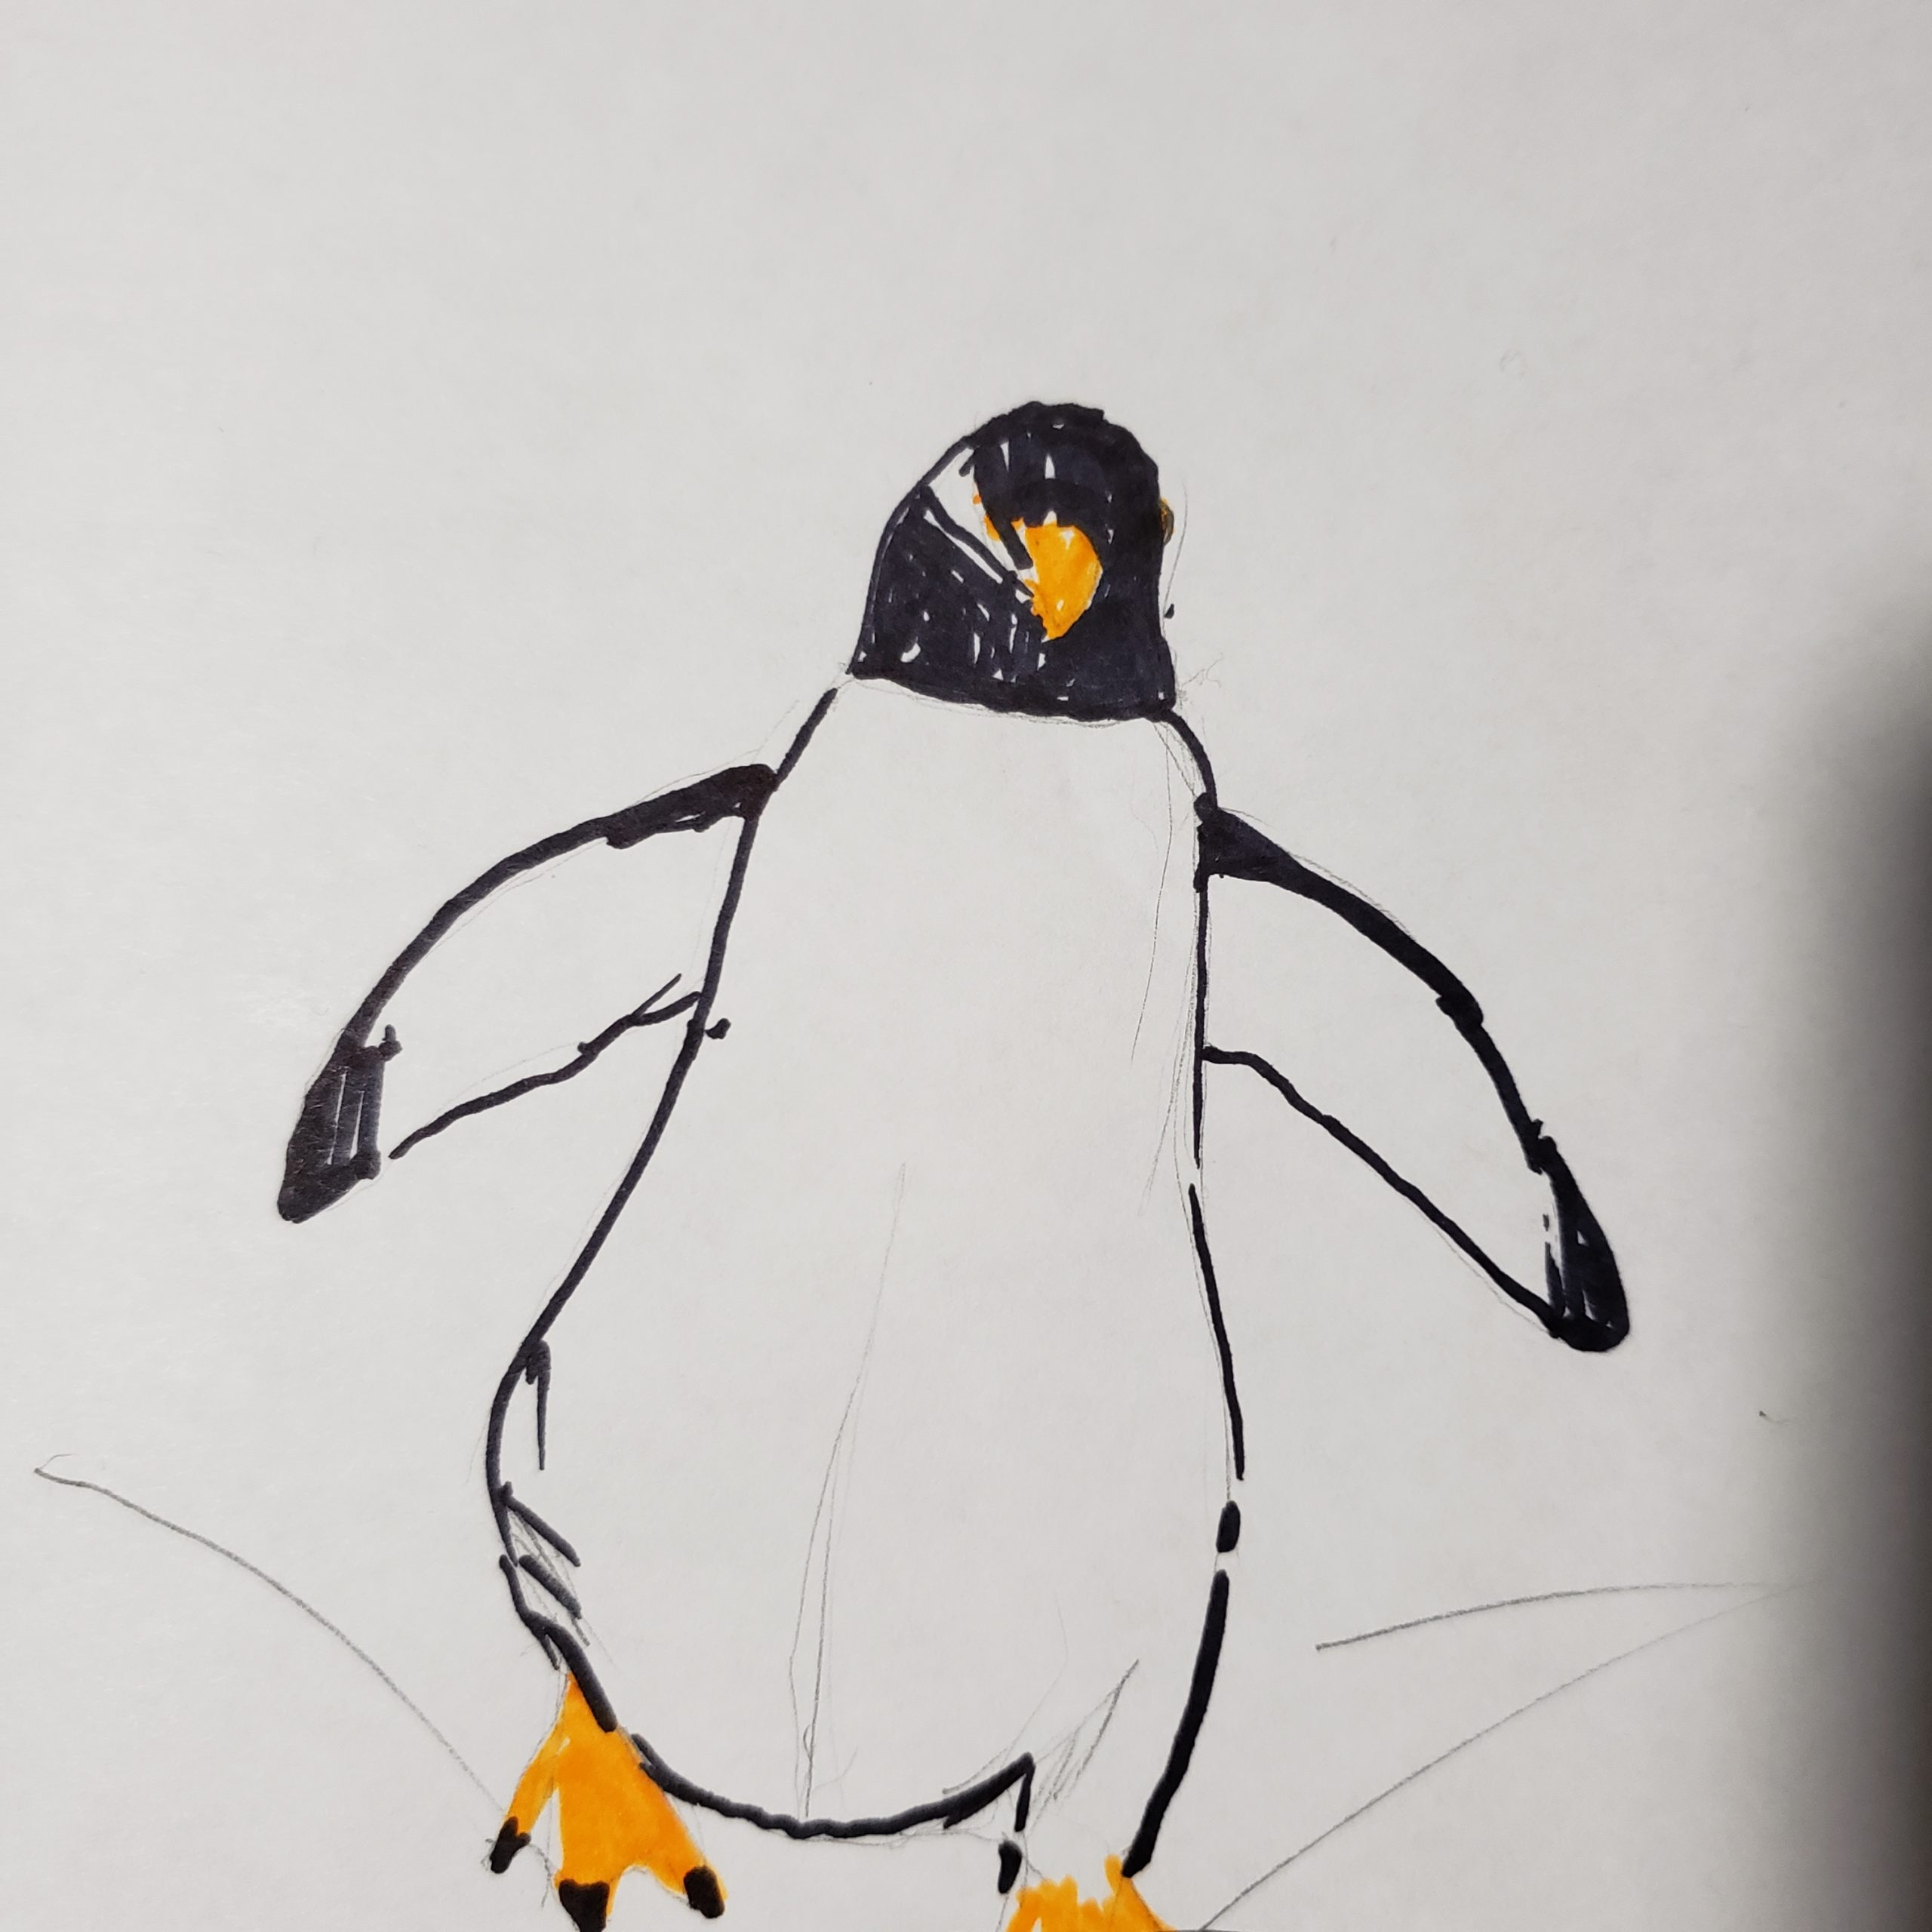 whitefish penguin